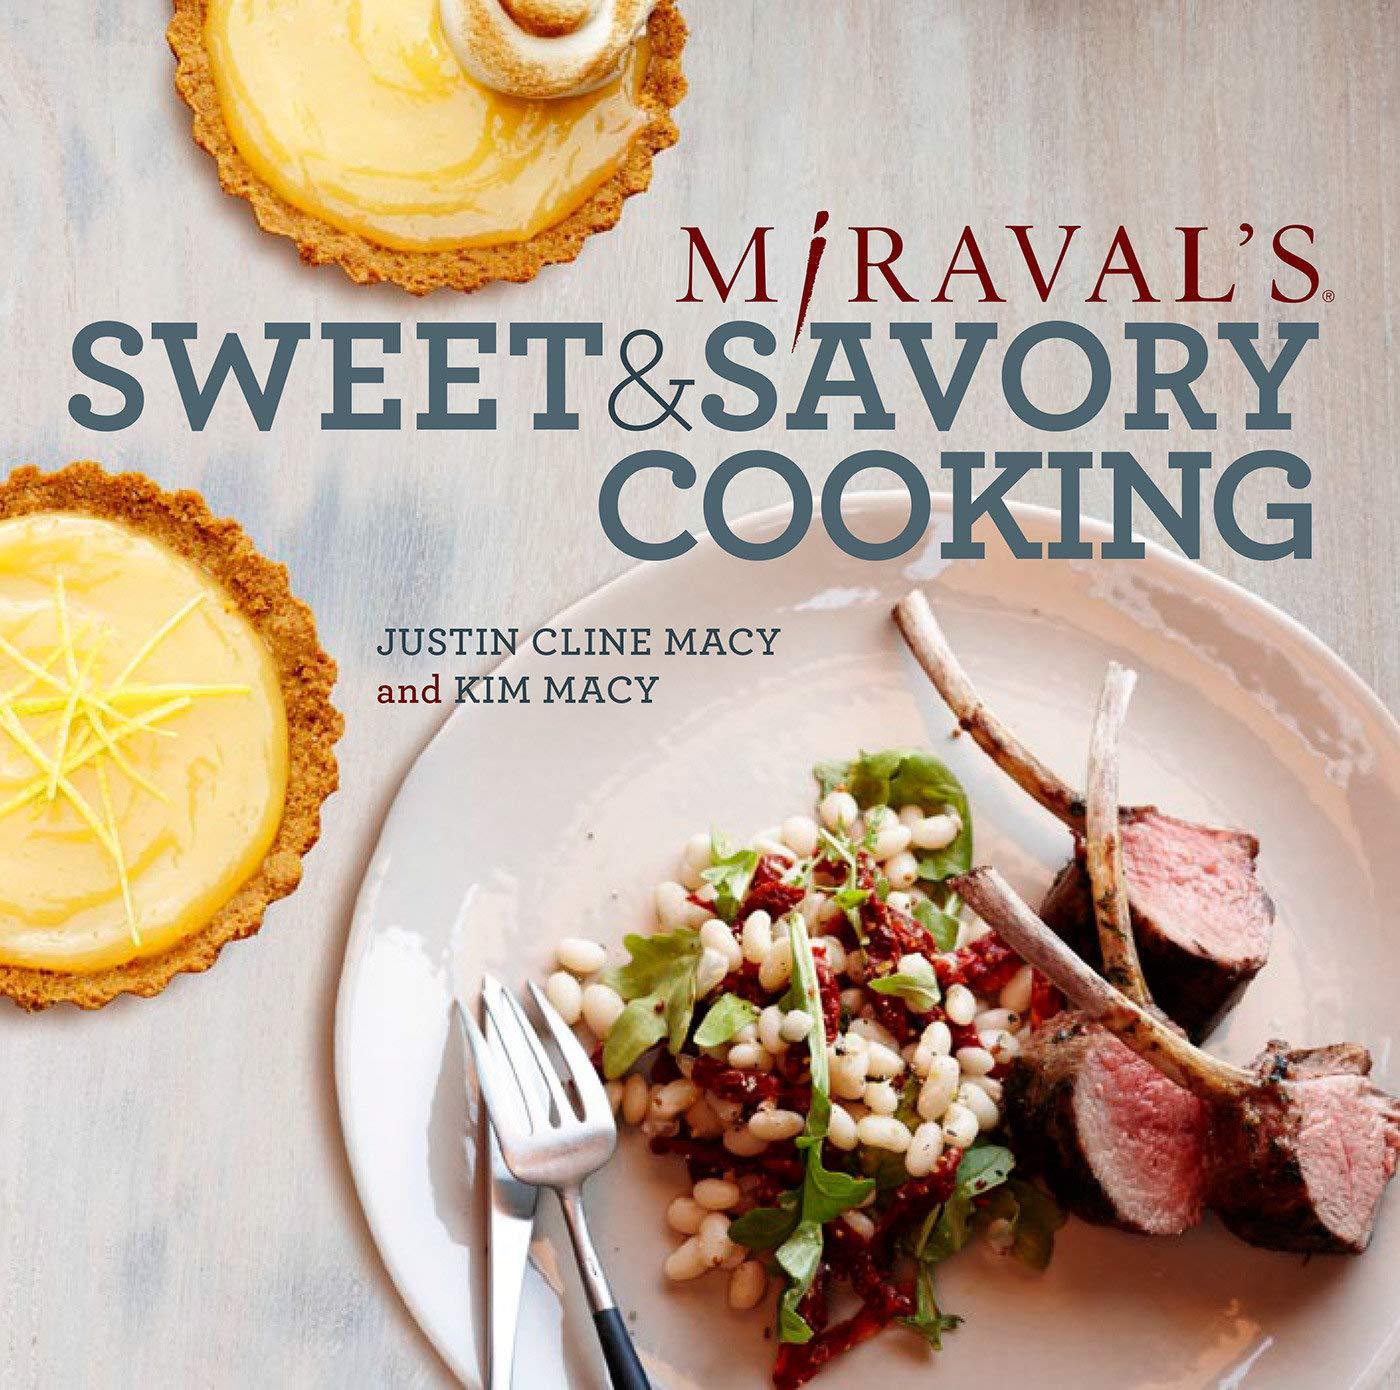 Miraval S Sweet Savory Cooking Cline Macy Justin Macy Kim 9781401941918 Amazon Com Books